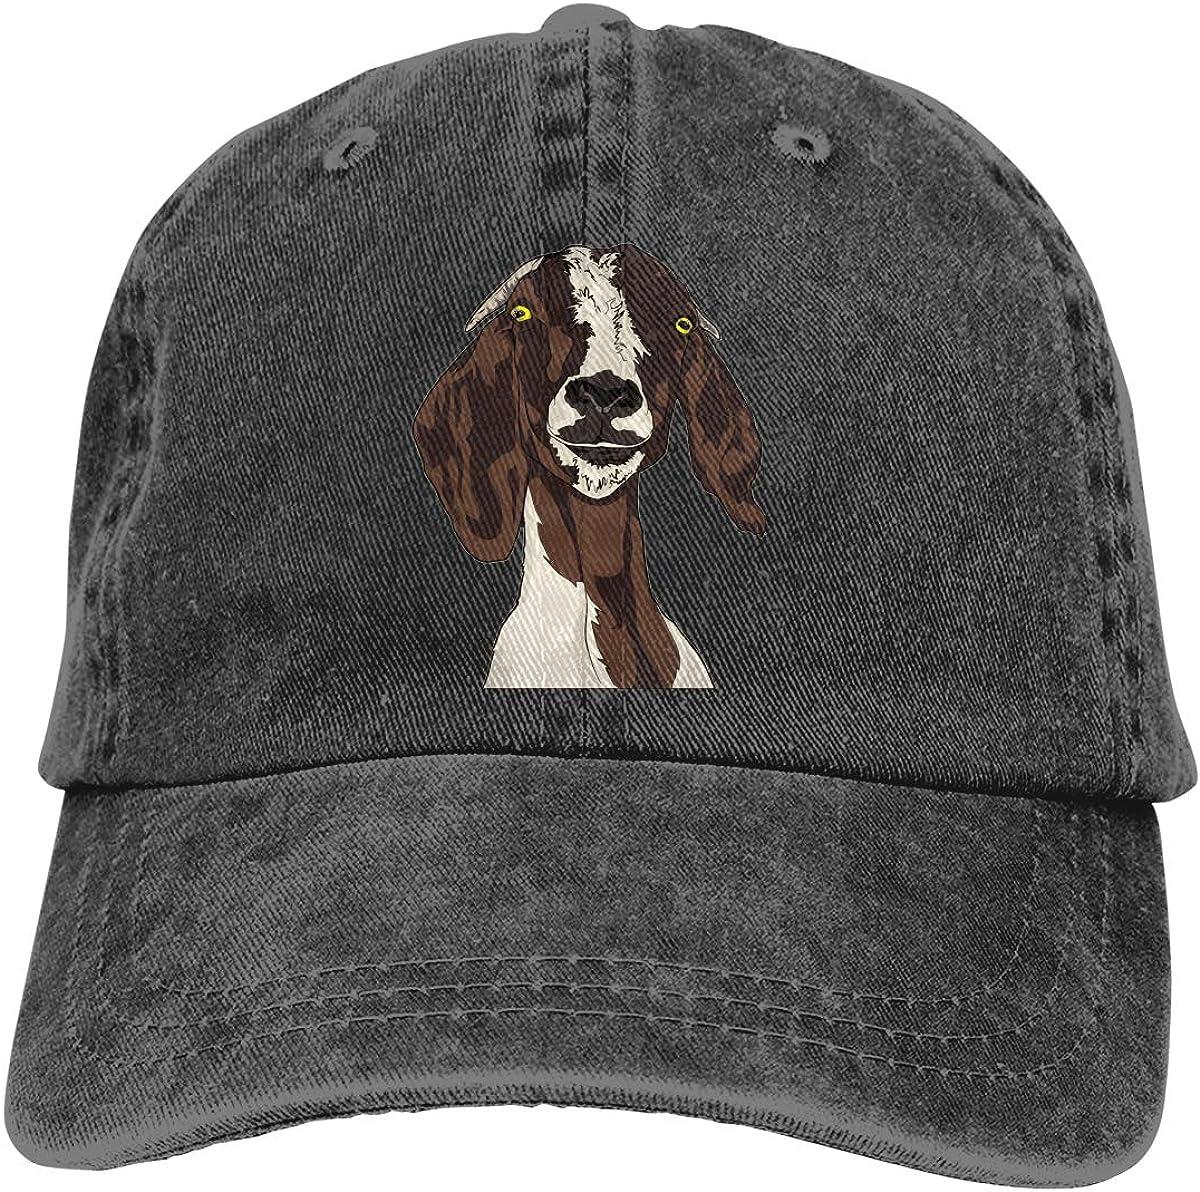 Adjustable Baseball Cap Low Profile Dad Hat Vintage Men Women Cool Wolf Head